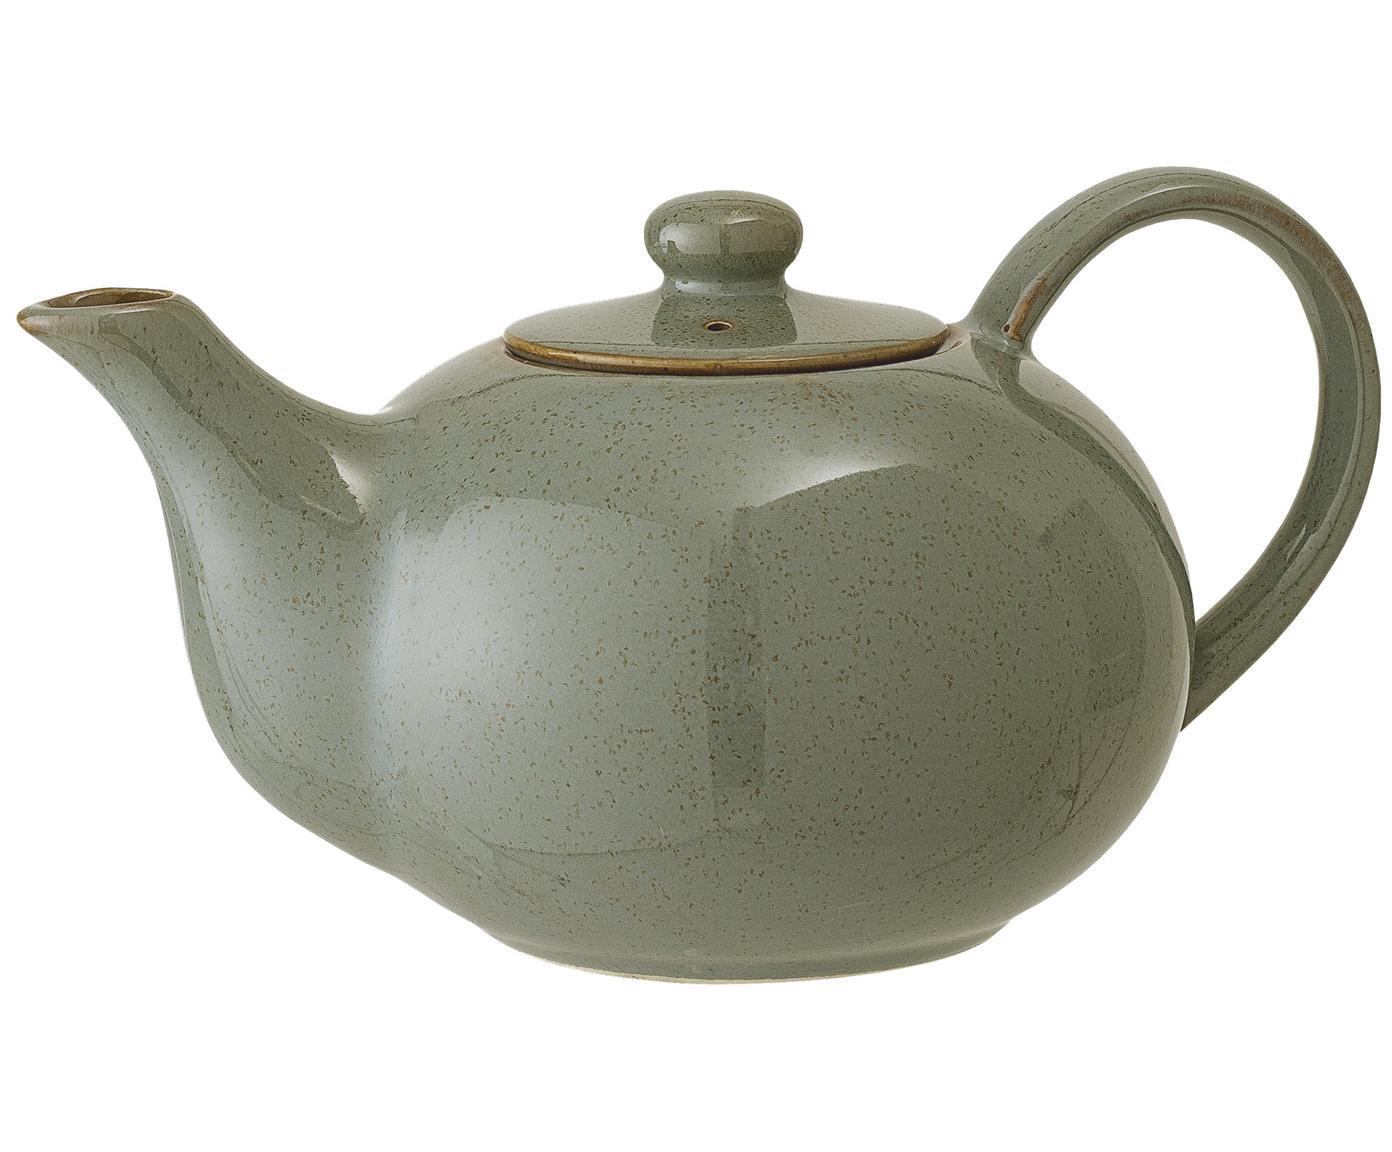 XS-Teekanne Pixie, Steingut, Grüntöne, 820 ml